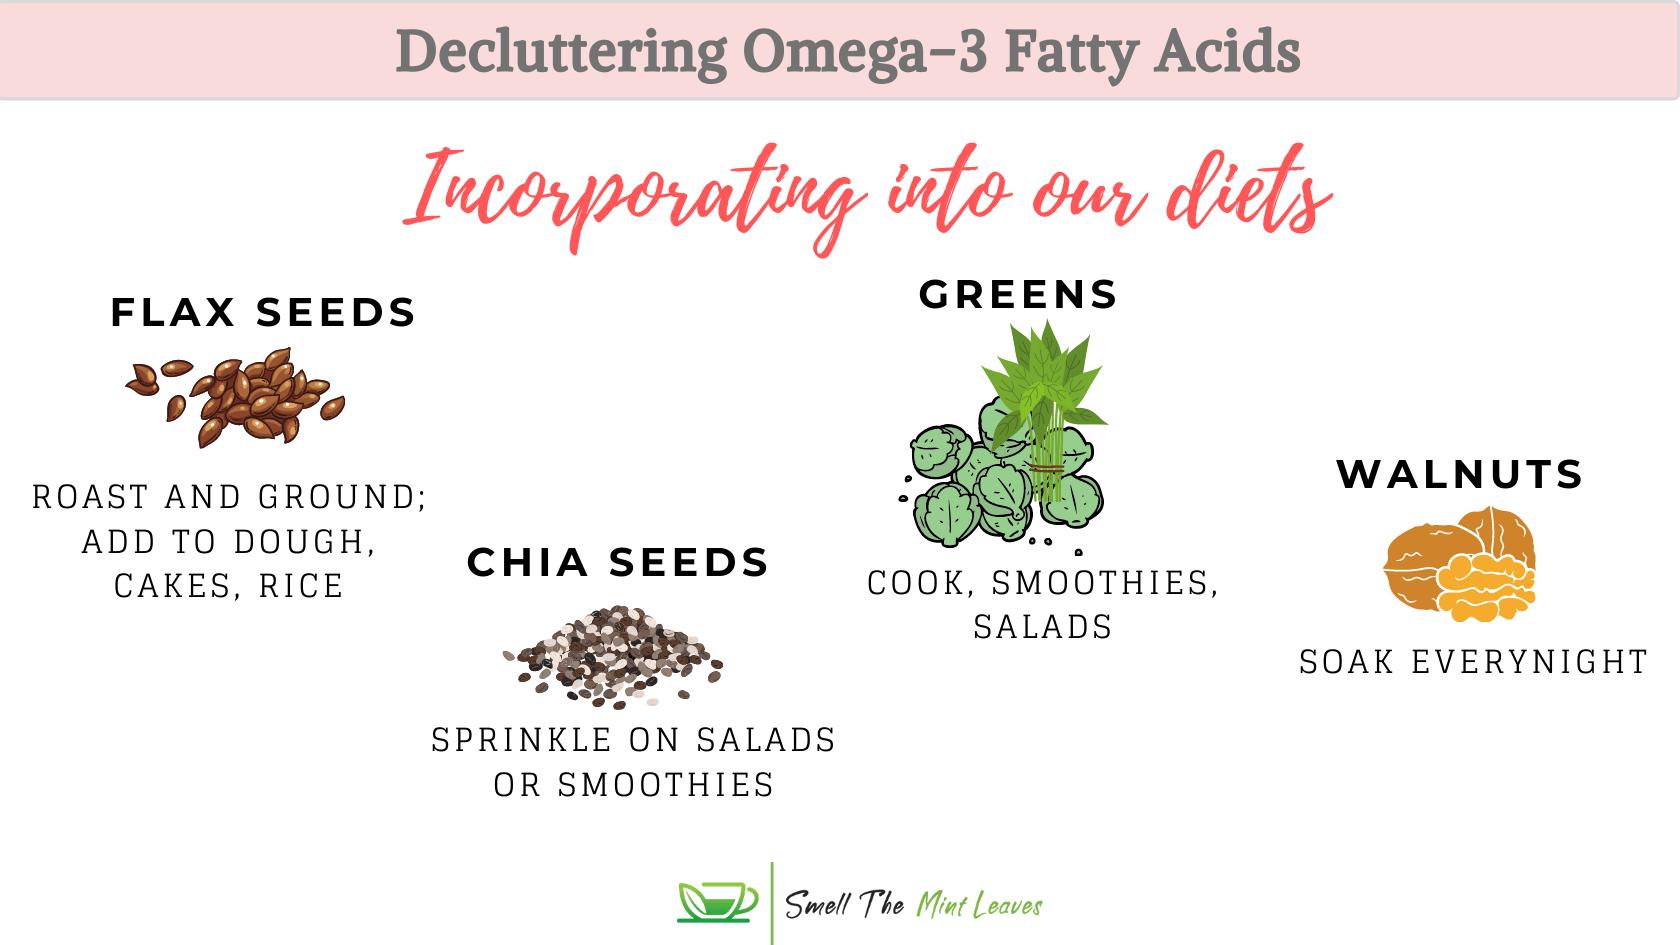 Omega-3 fatty acids incorporate into diets